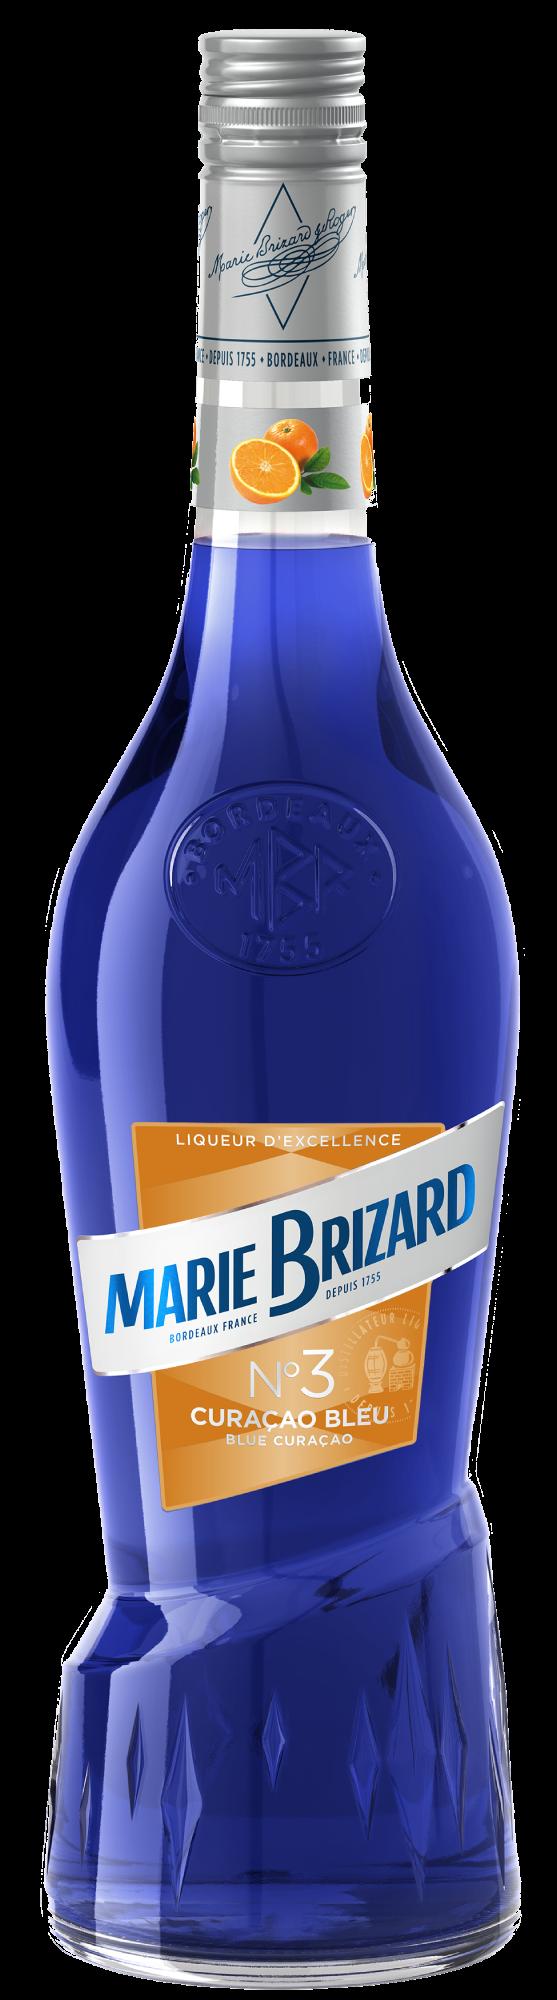 Marie Brizard Curacao Bleu - магазин-склад wine wine